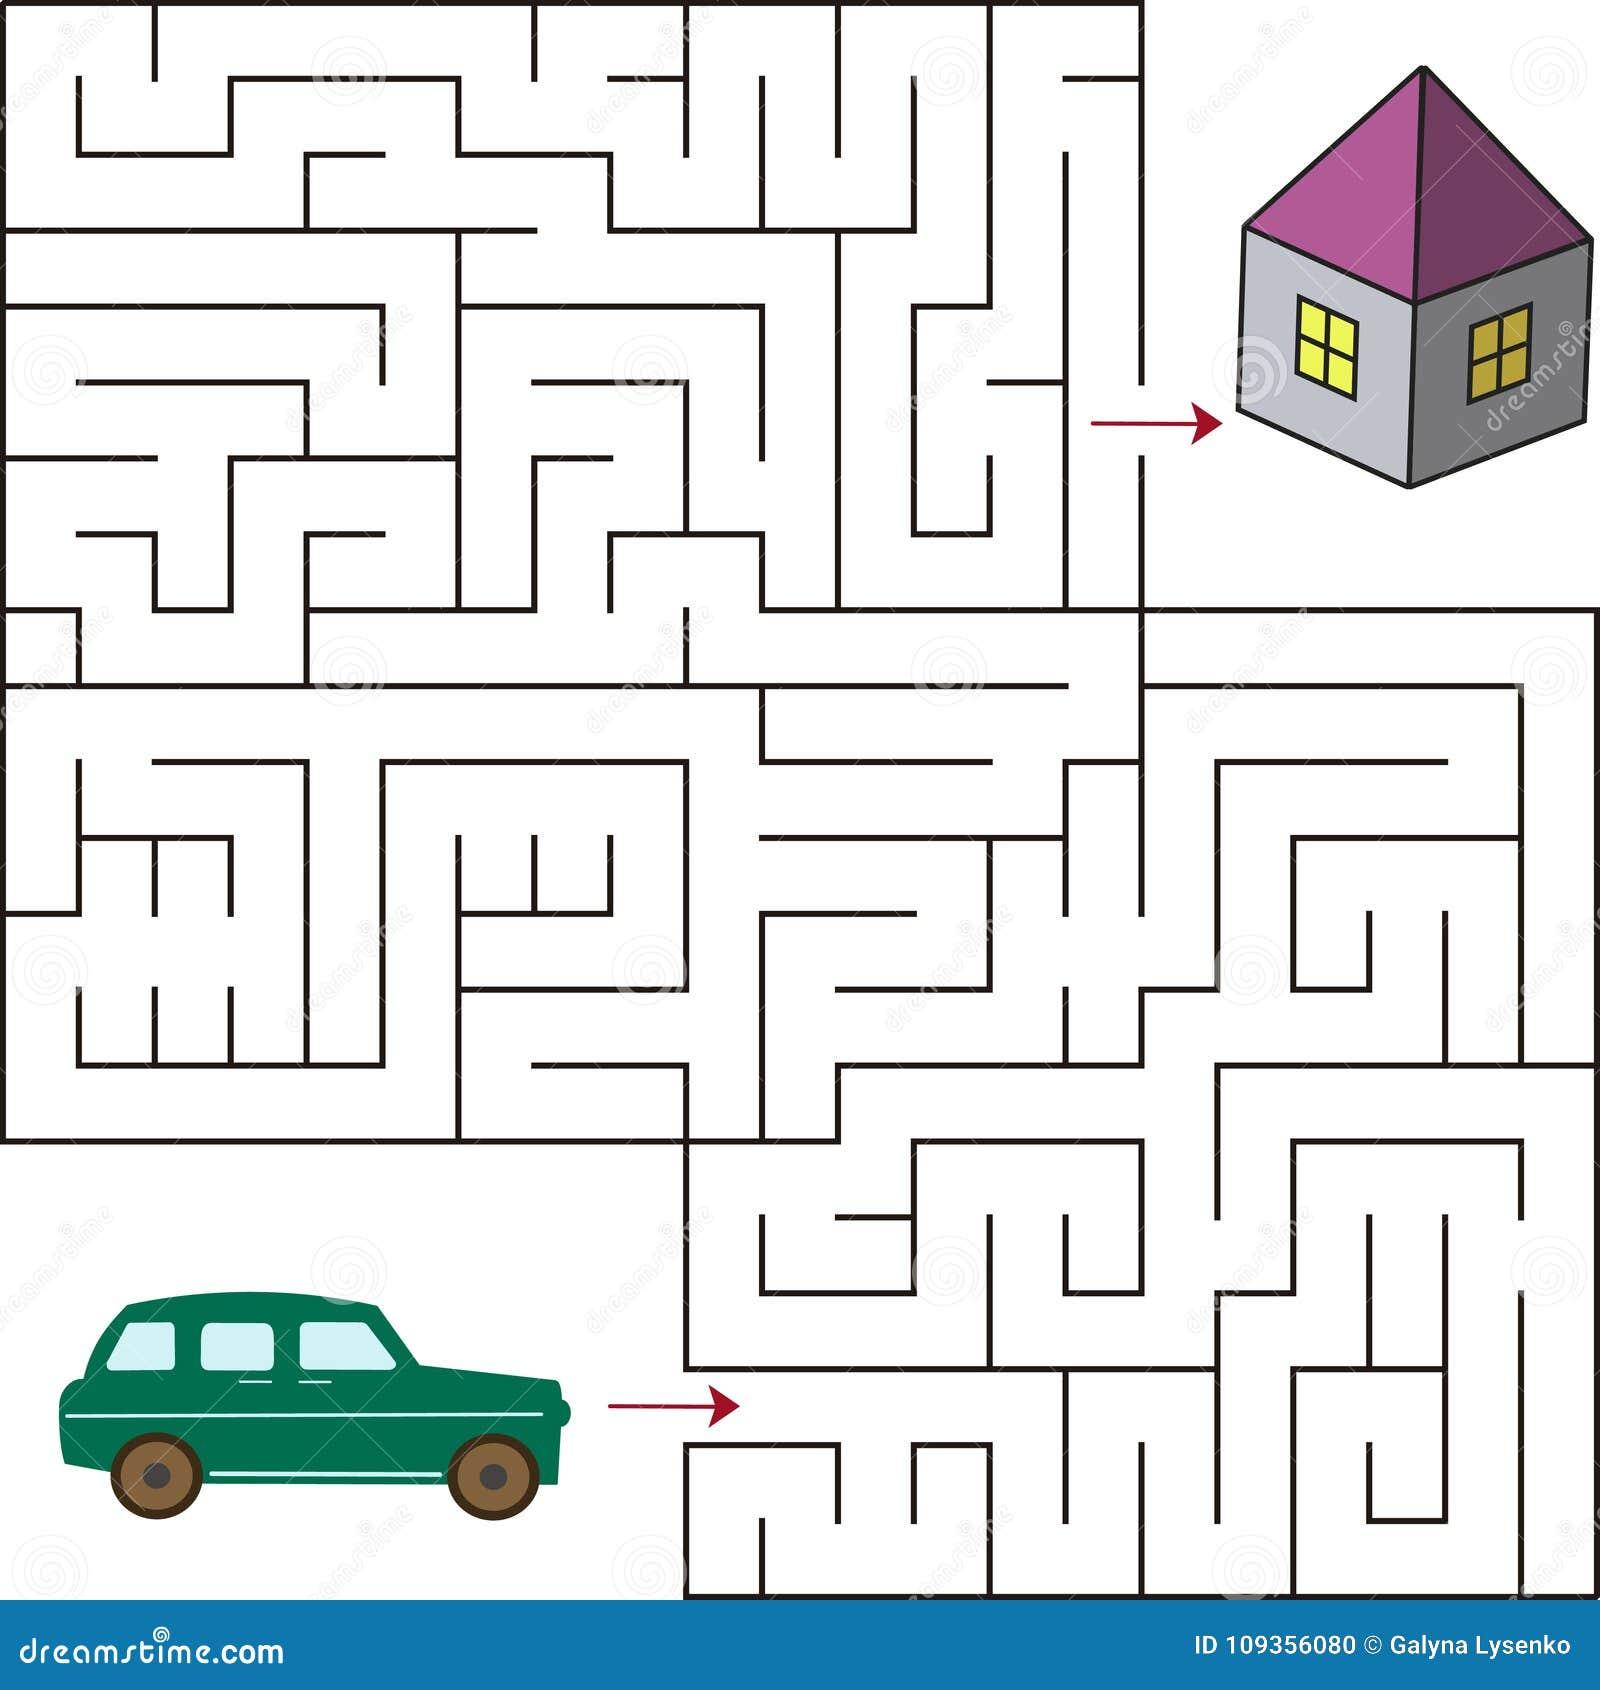 The Maze Game